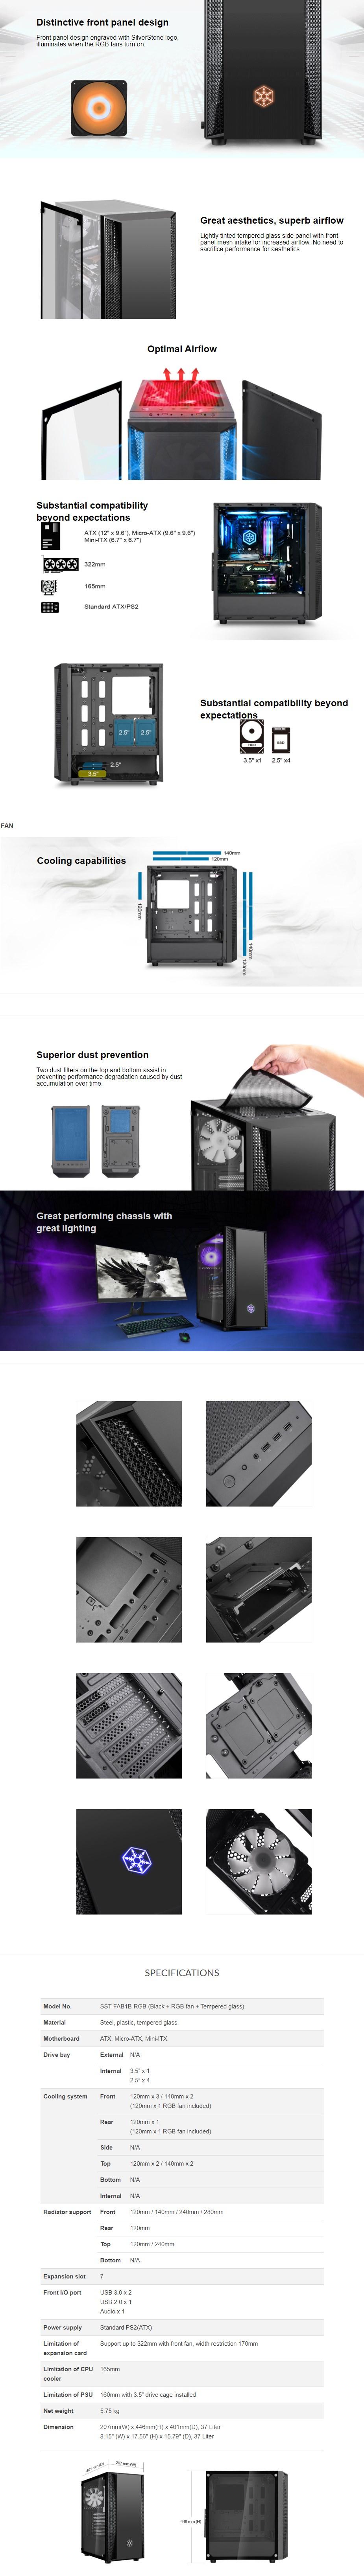 SilverStone Fara B1 RGB Tempered Glass Mid-Tower ATX Case - Black - Overview 1